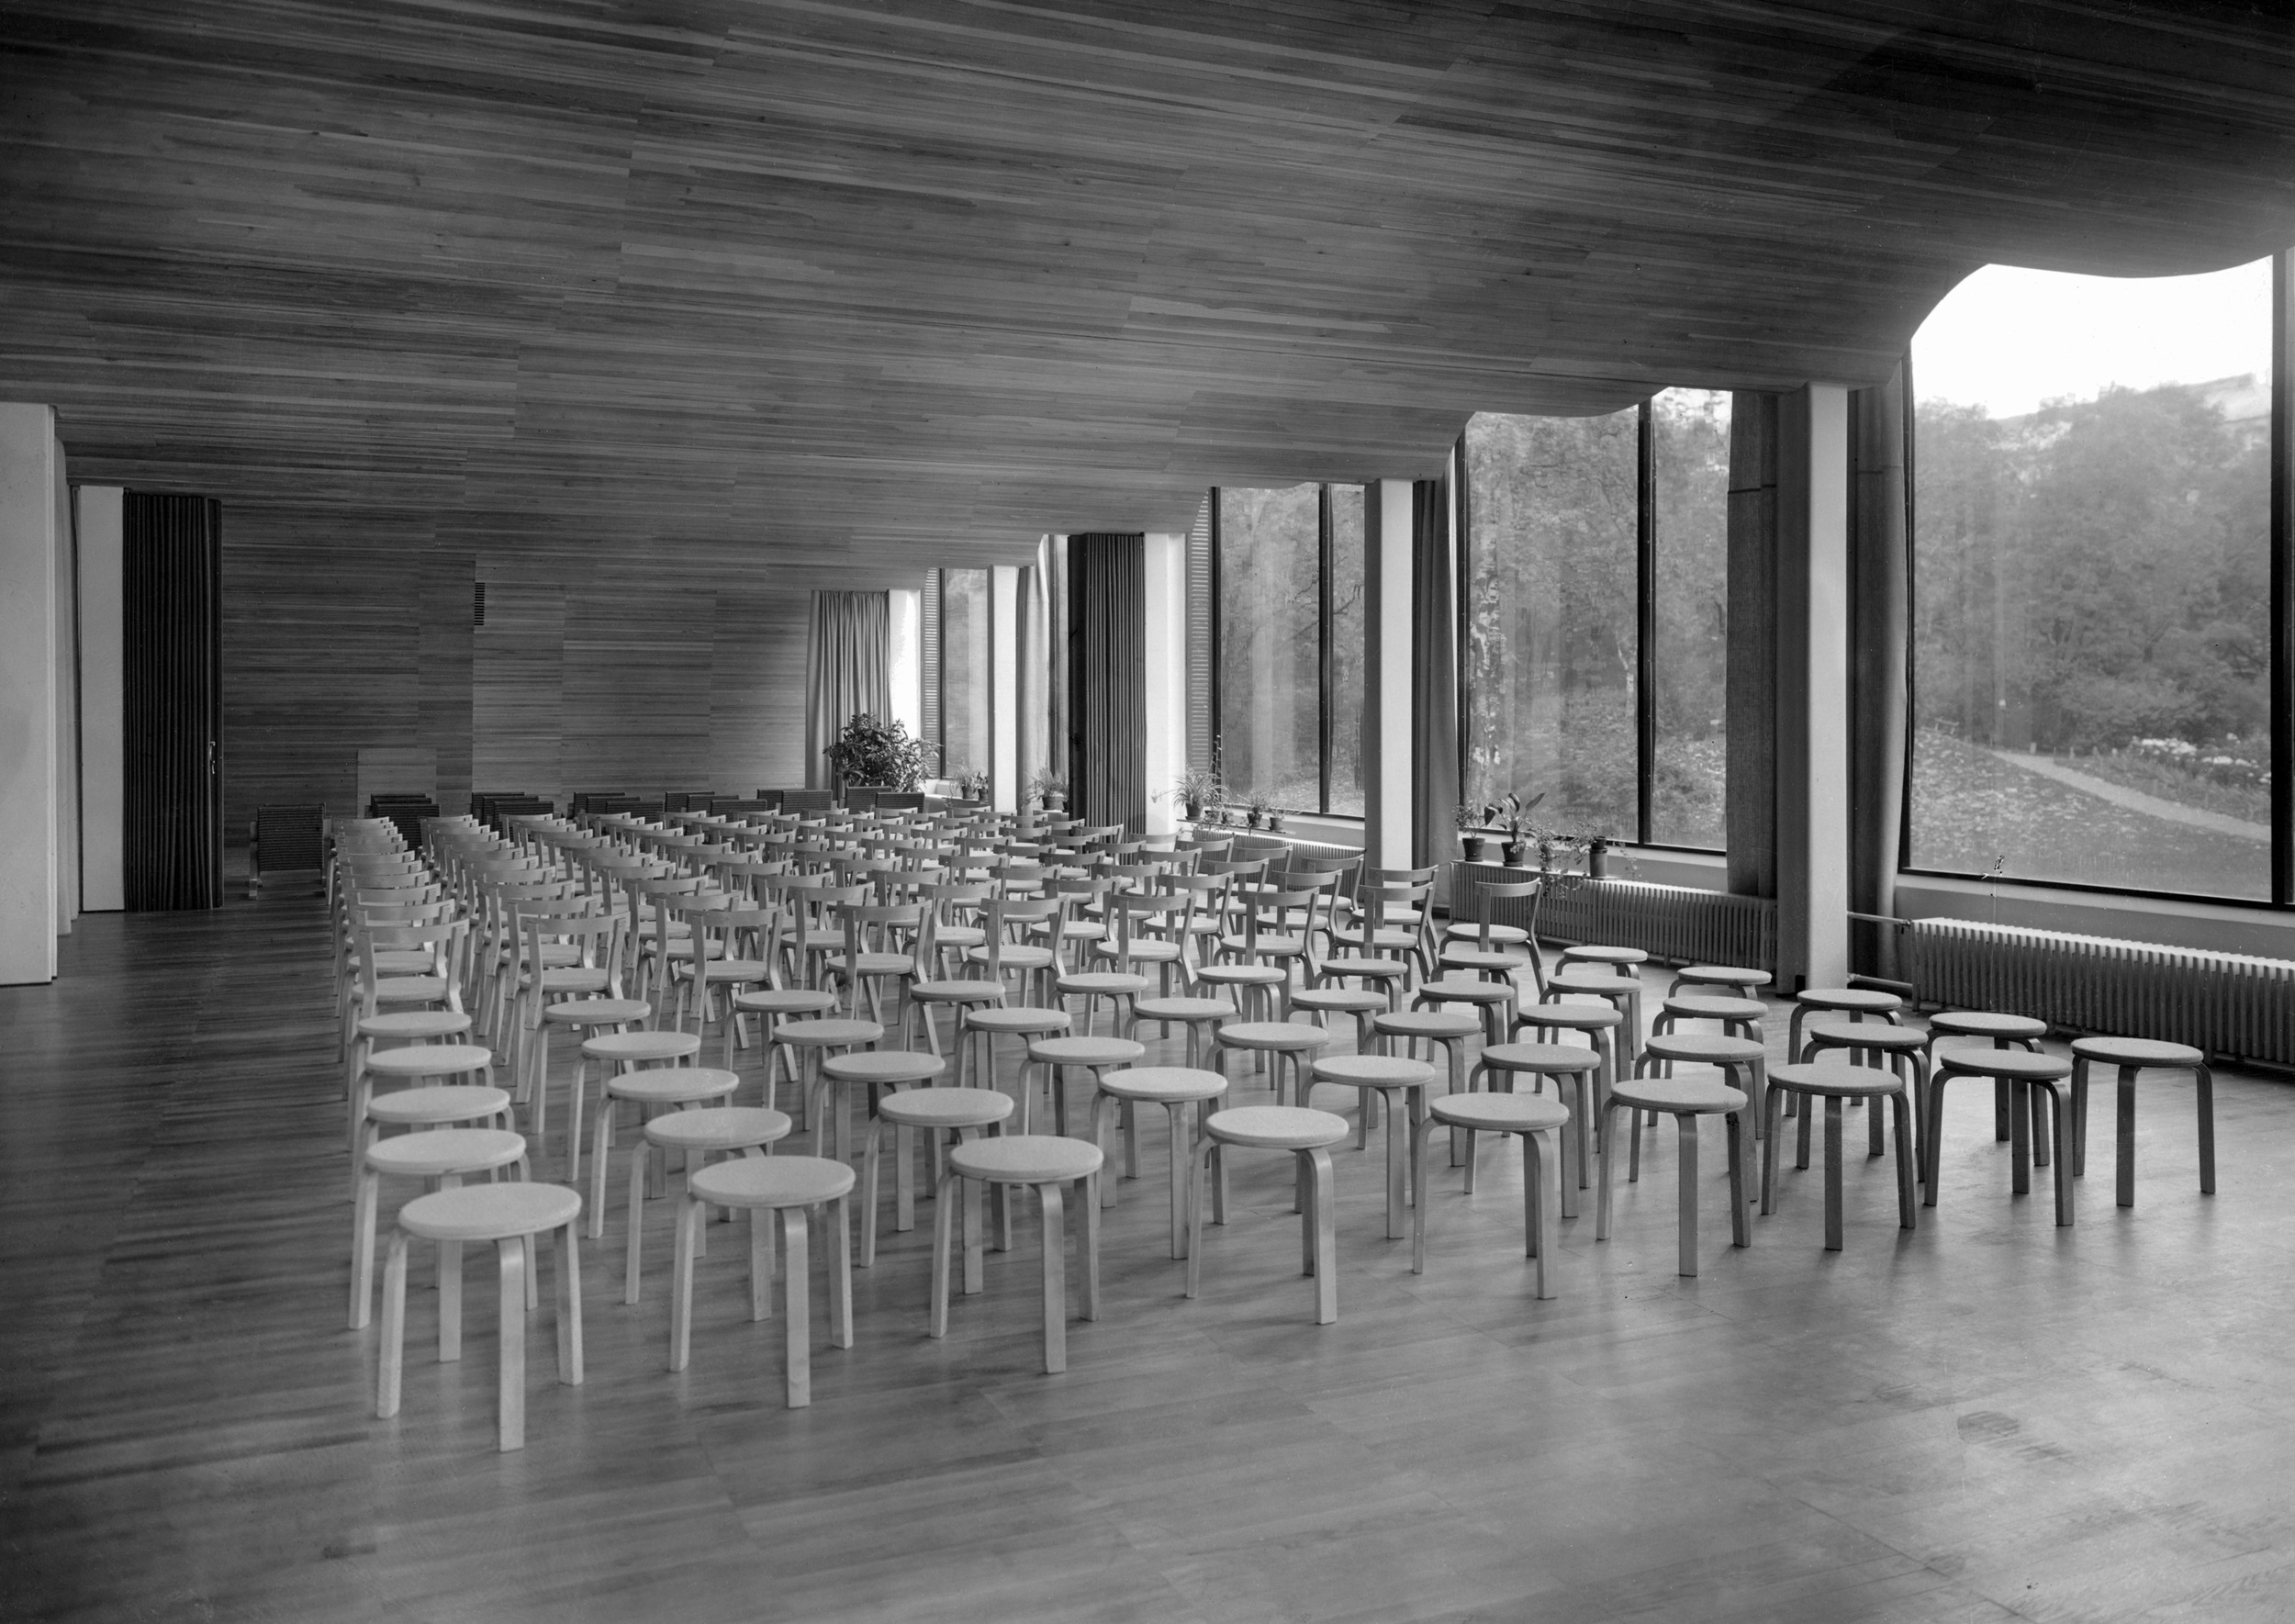 AALTO_43-004-112_Luentosali, Kuva Gustaf Welin, Alvar Aalto–museo 1935 copy.jpg